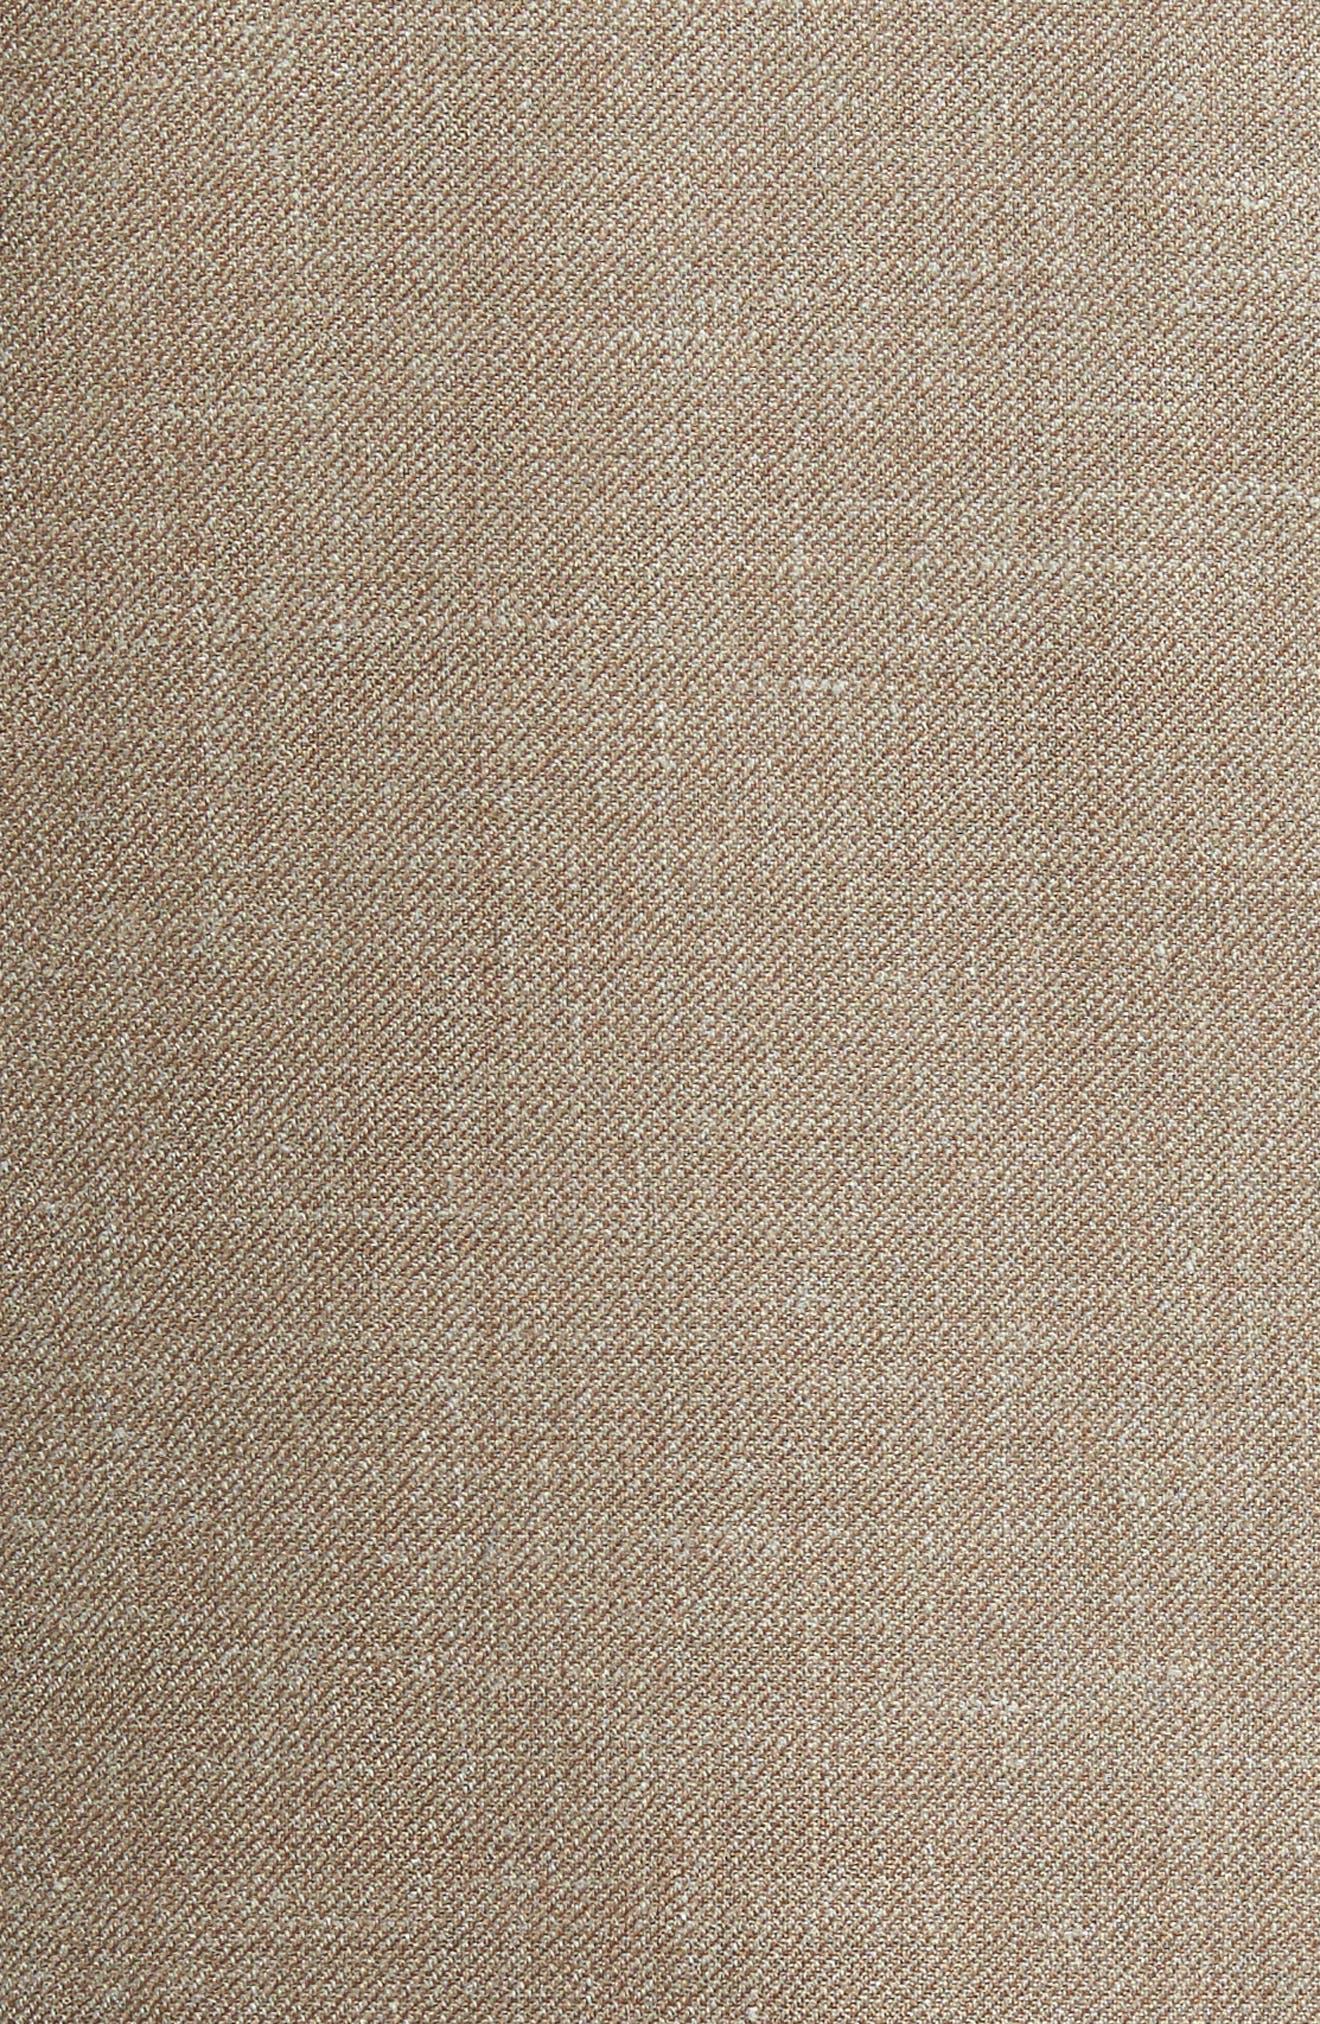 Classic Fit Wool Blend Blazer,                             Alternate thumbnail 5, color,                             Tan